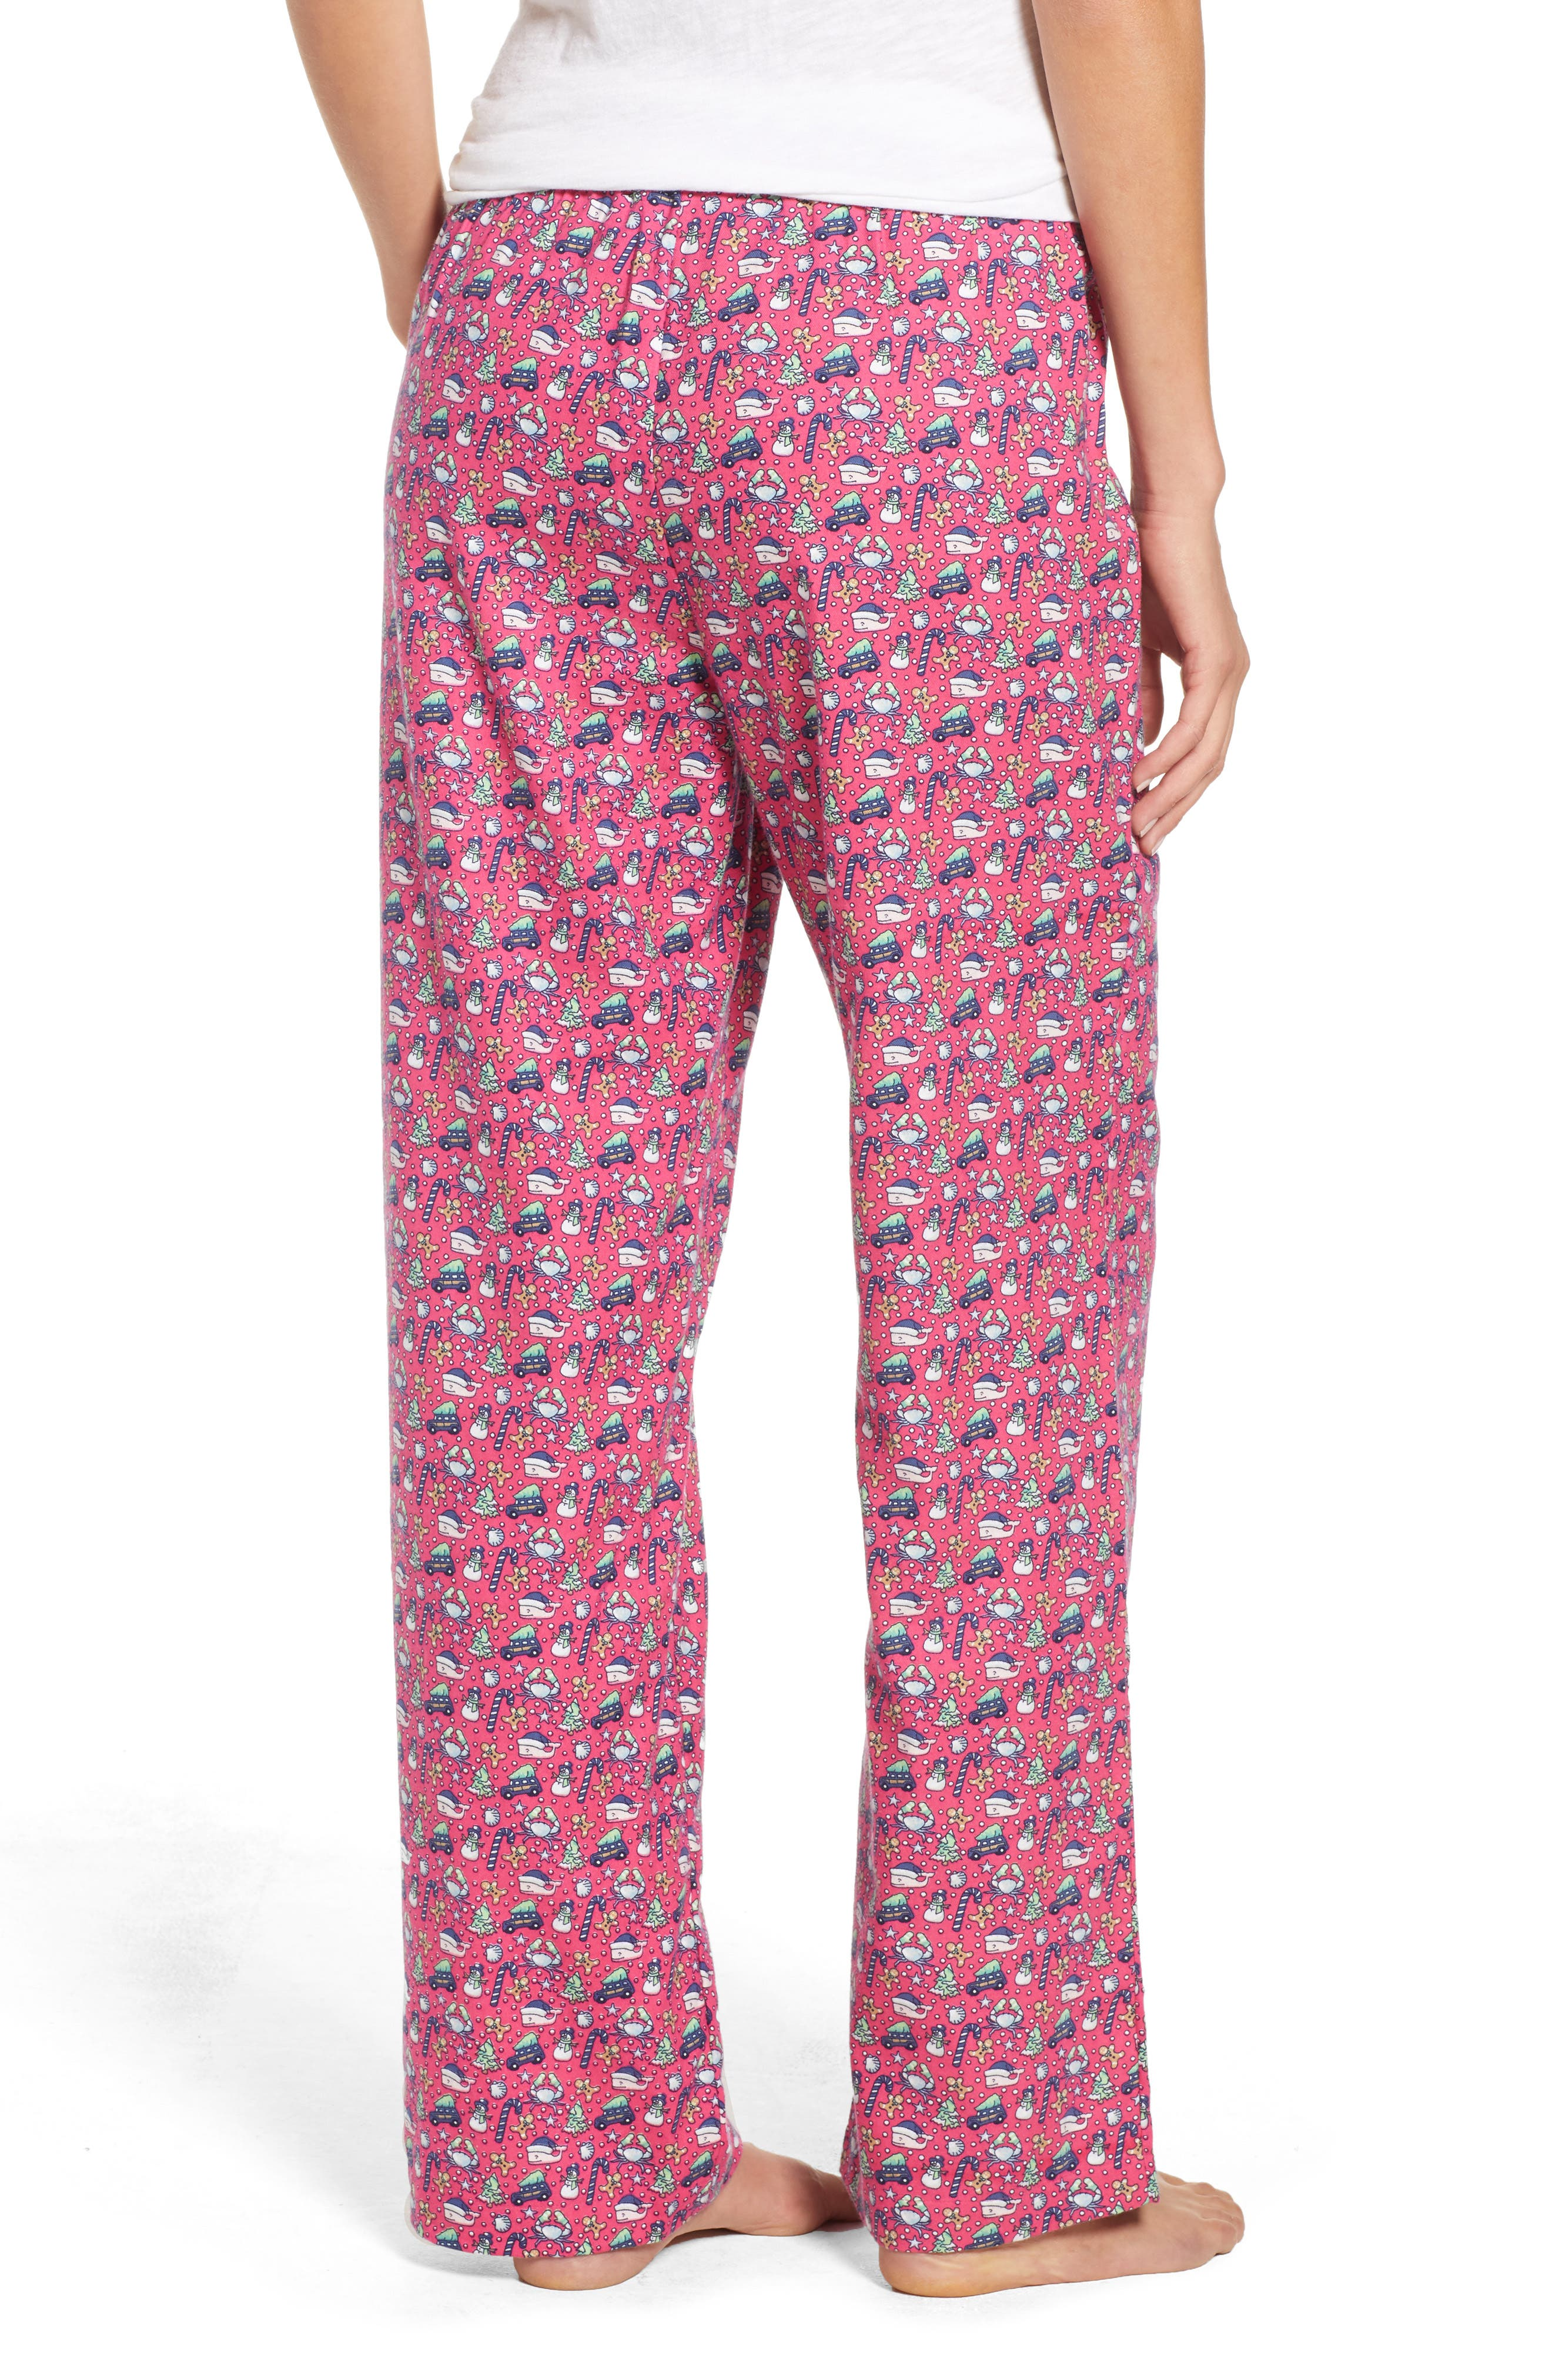 Holiday Print Lounge Pants,                             Alternate thumbnail 2, color,                             GOJI BERRY